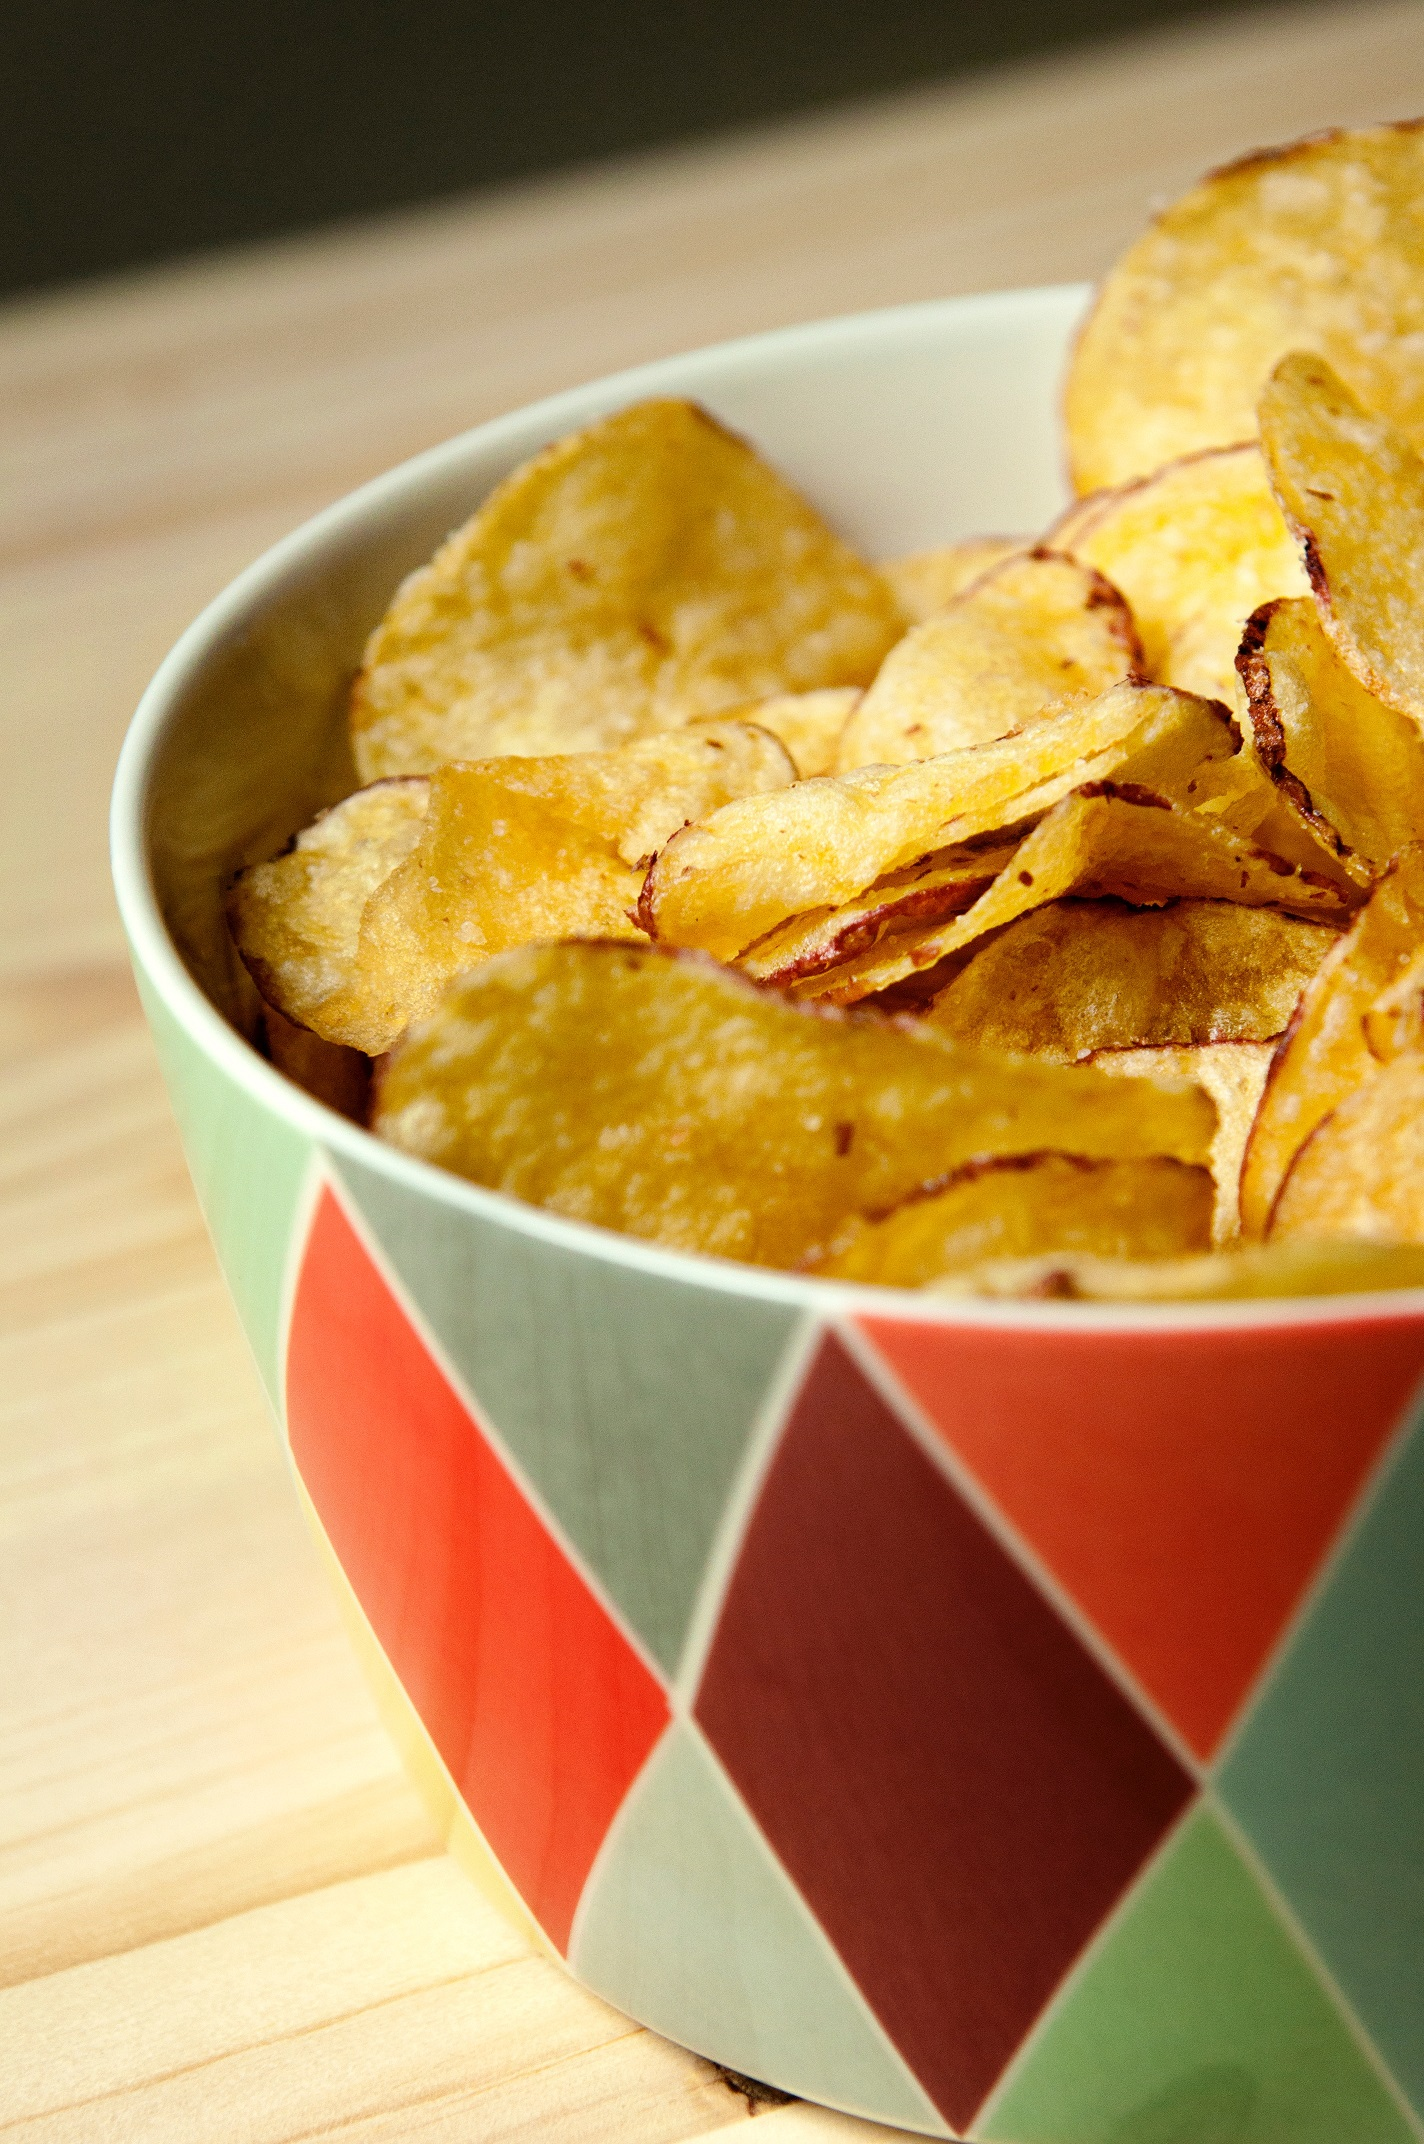 patatine in busta acrilammide